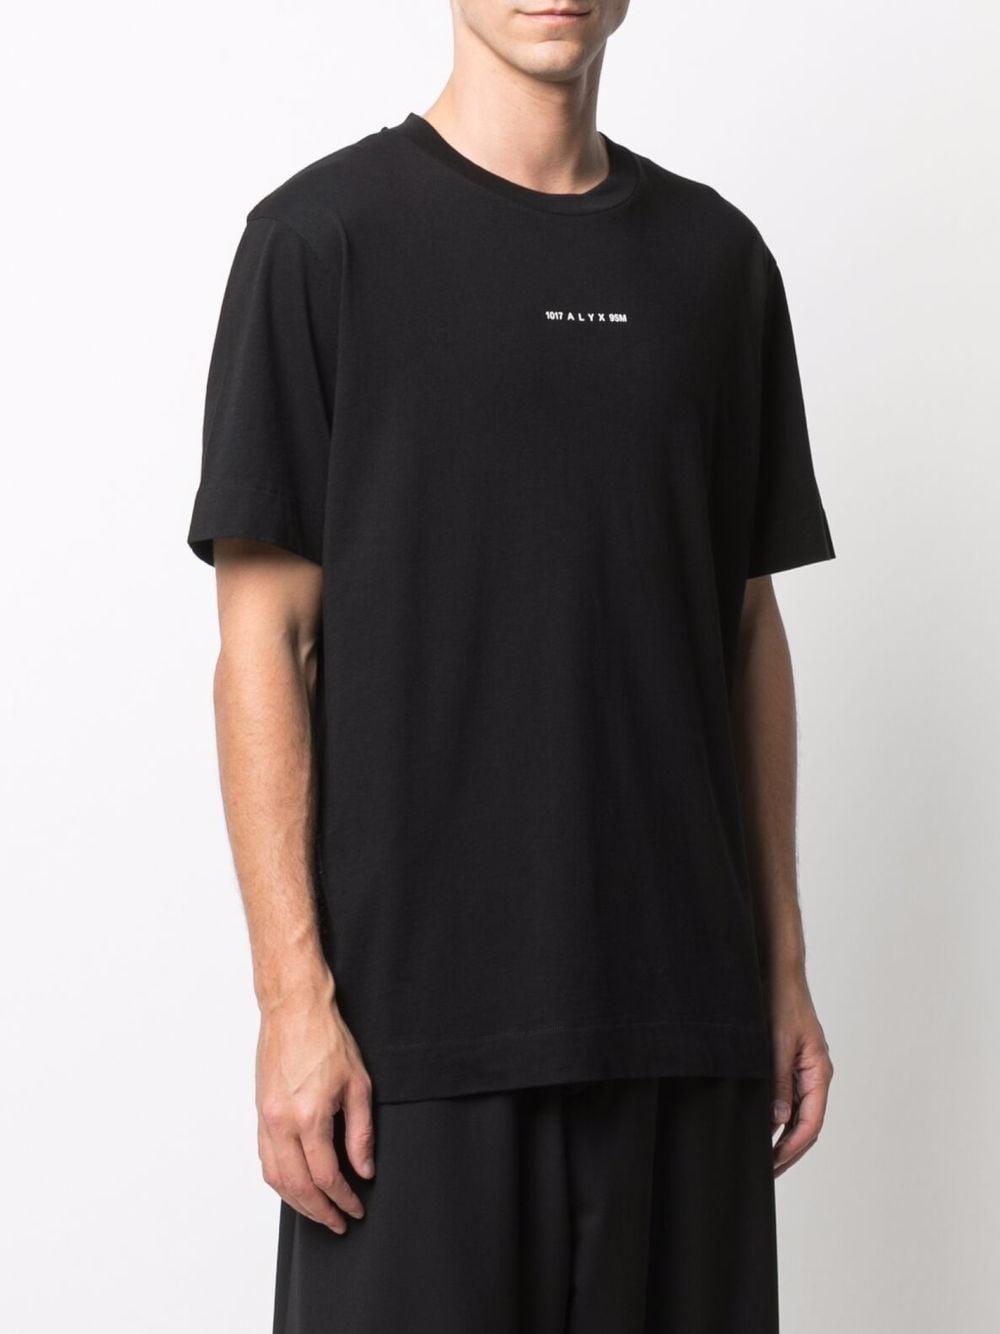 logo t-shirt man black in cotton 1017 ALYX 9SM | T-shirts | AAUTS0232FA01BLK0001